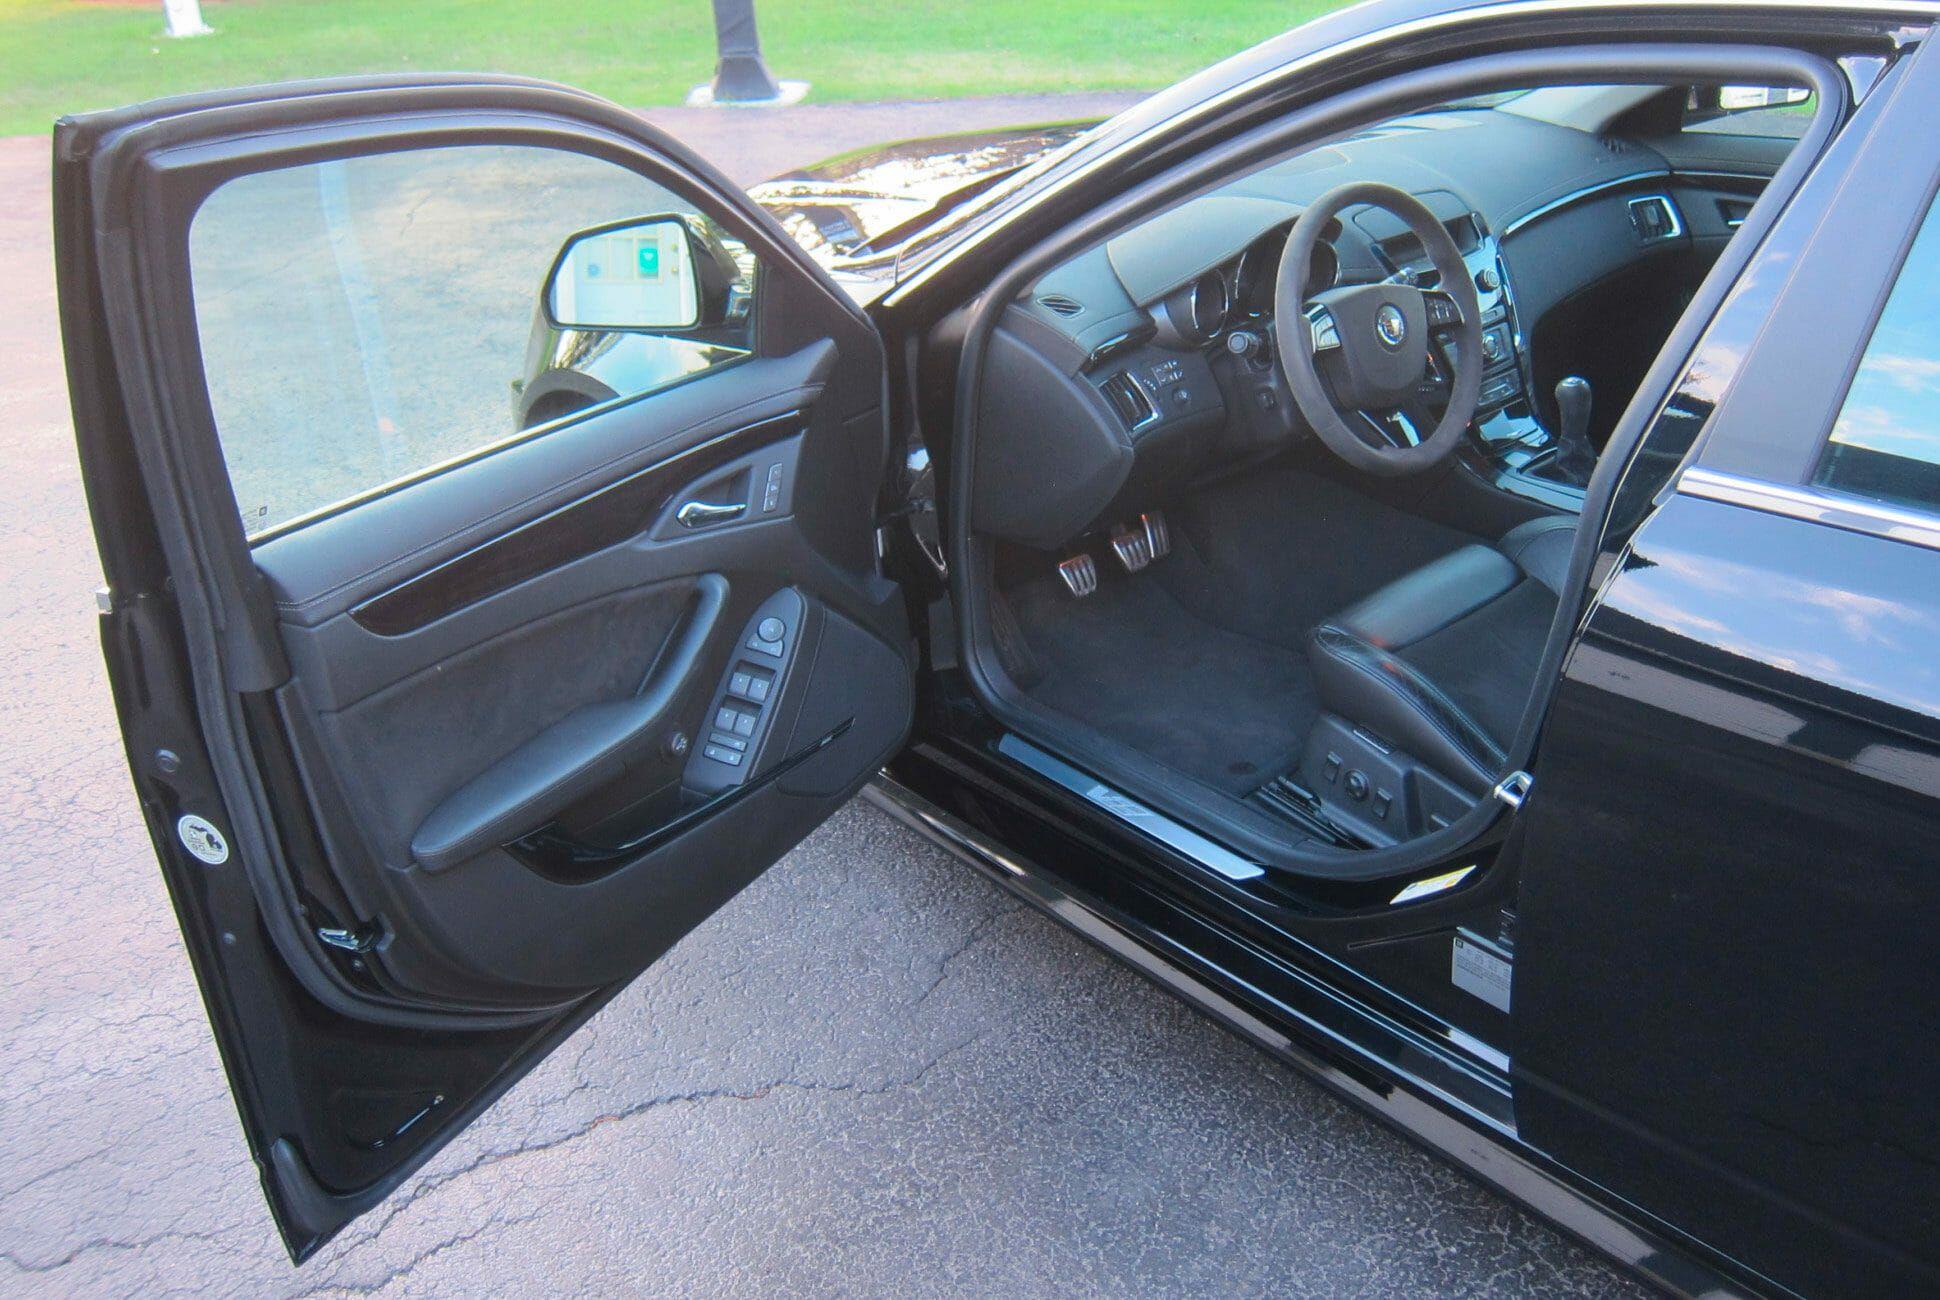 2011-Cadillac-CTS-V-Wagon-Manual-gear-patrol-slide-6